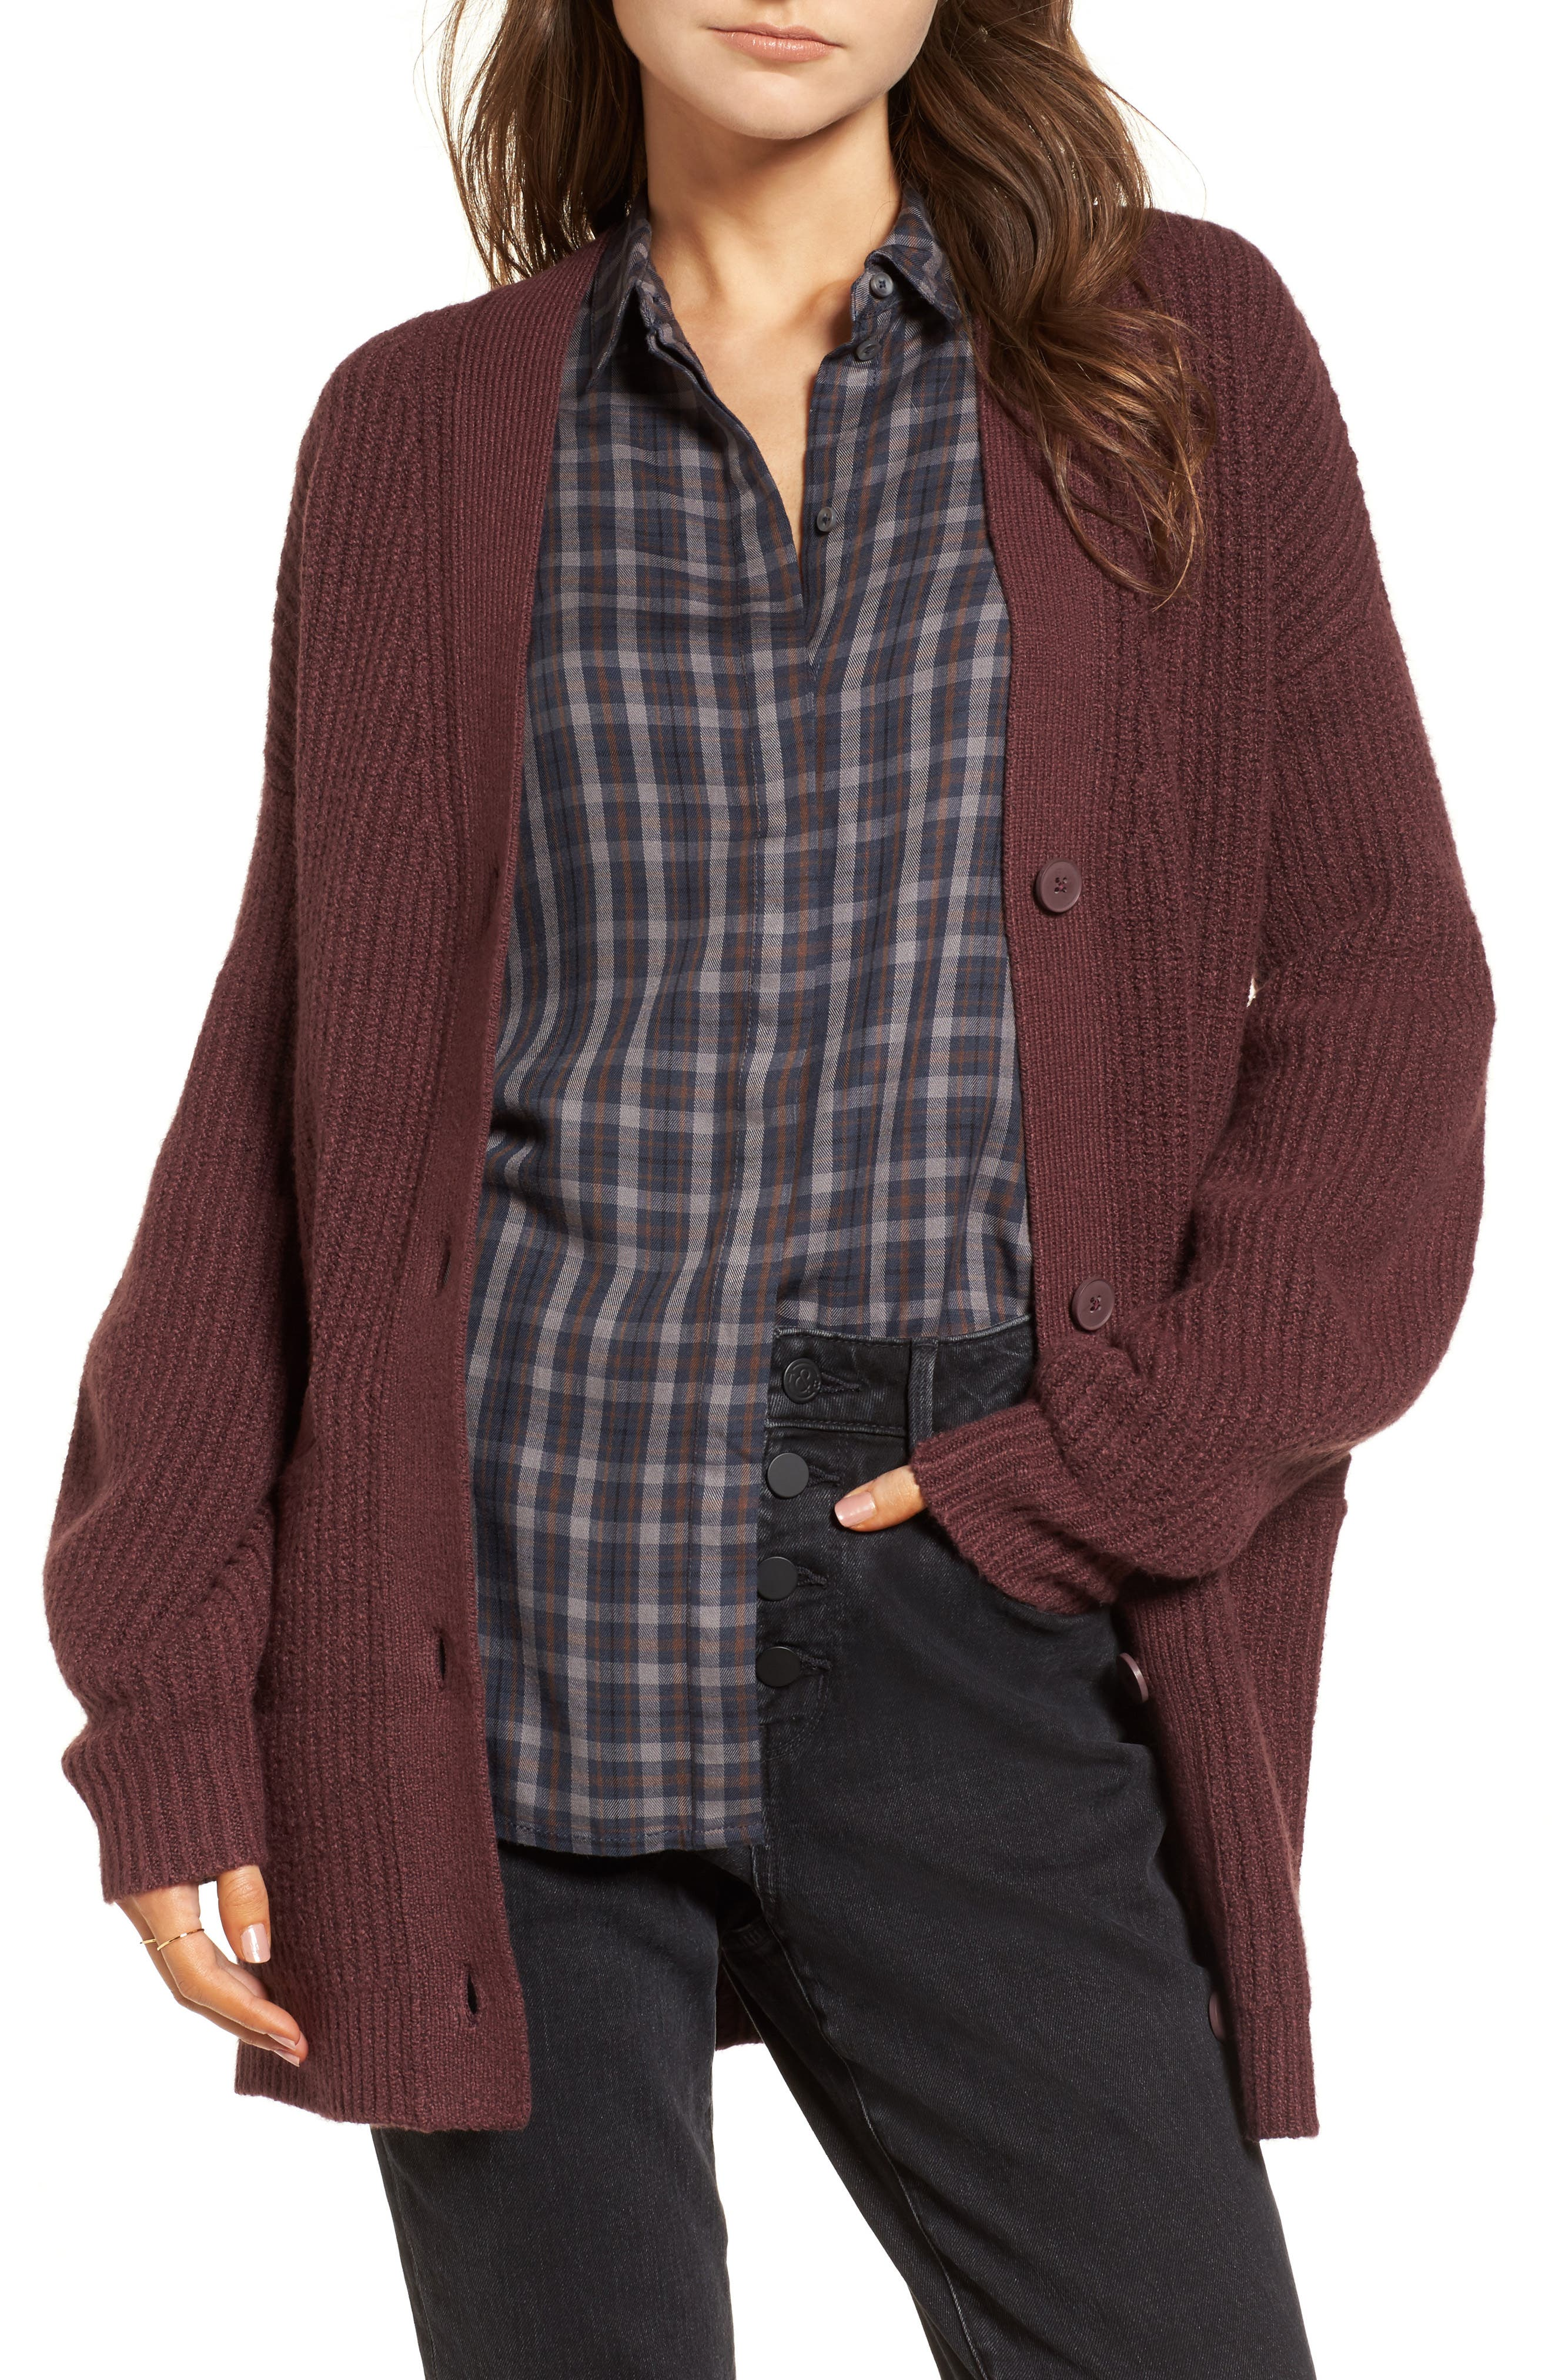 Ribbed Cardigan Sweater,                             Main thumbnail 1, color,                             Burgundy Fudge